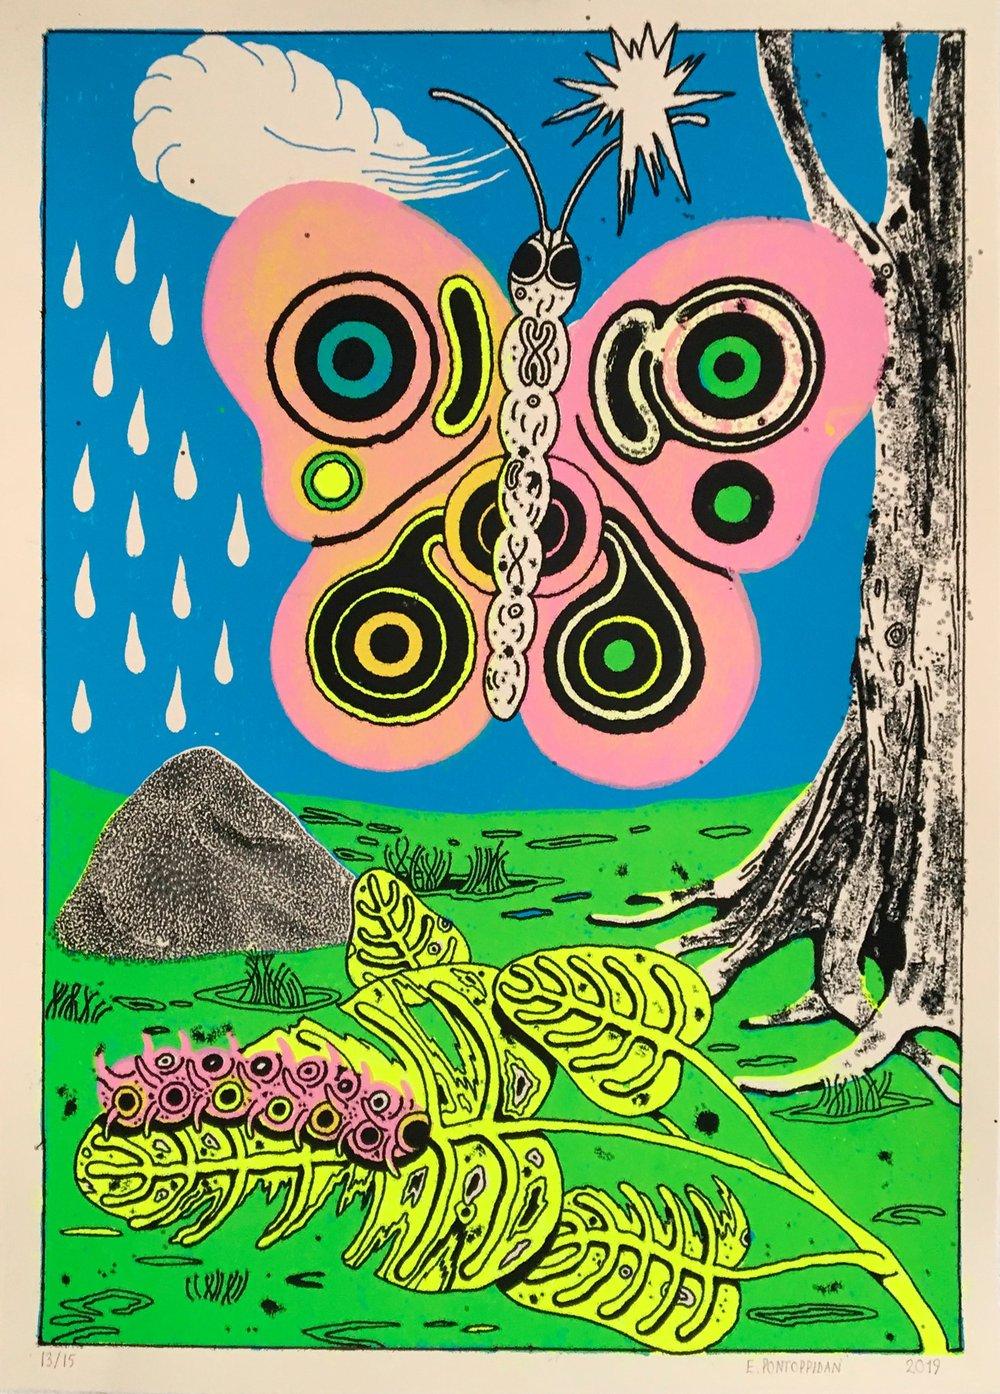 Image of Buttafly- Print by erik Pontoppidan